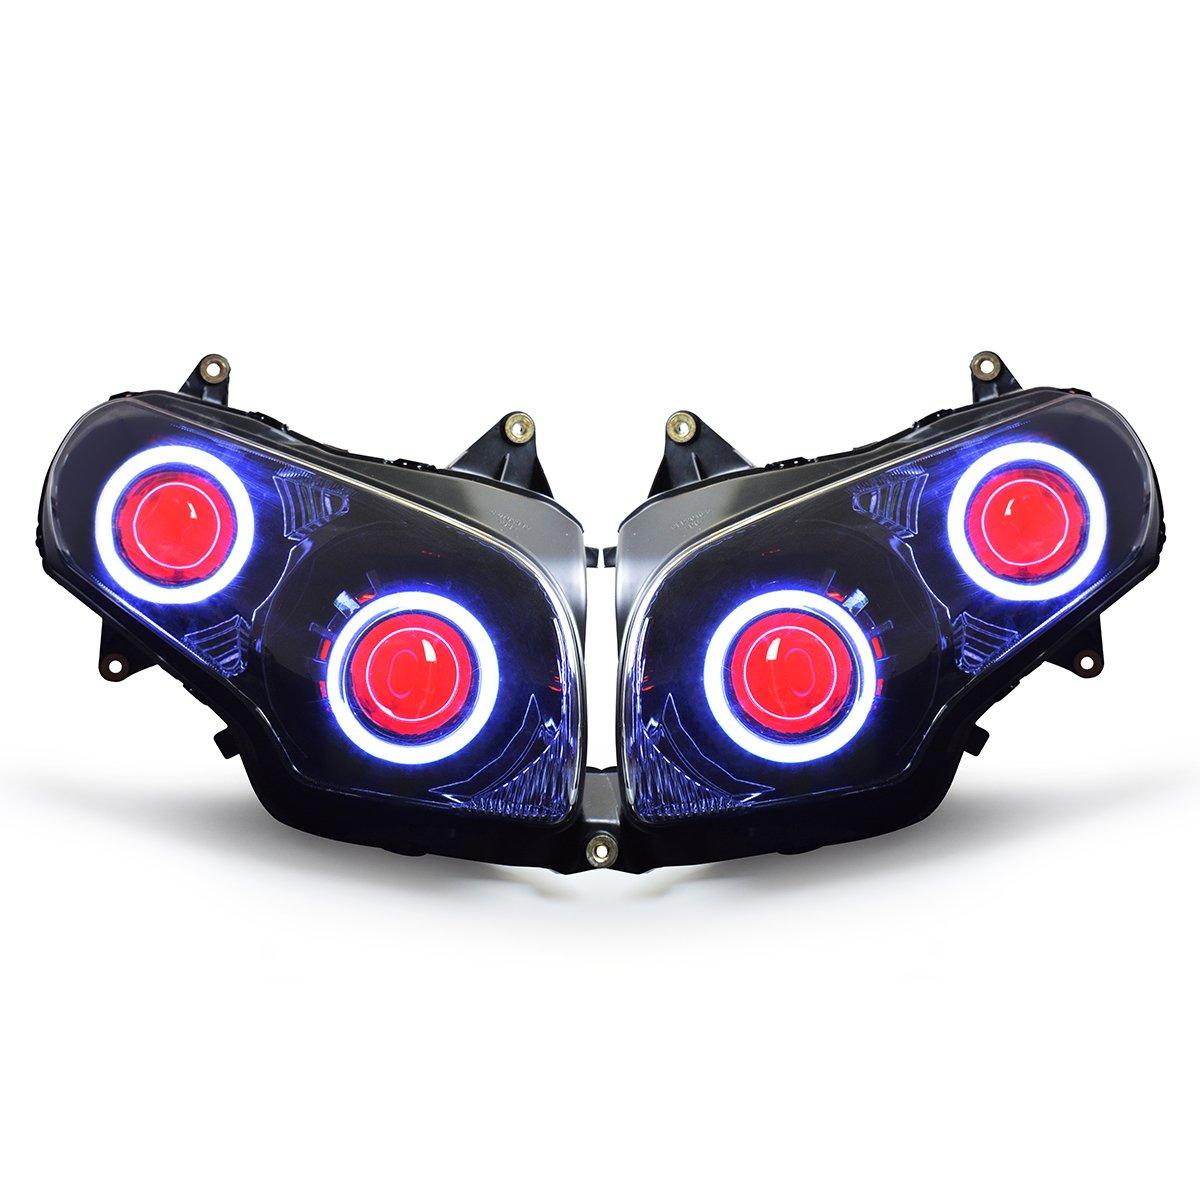 2016 Honda Goldwing >> Amazon Com Kt Led Angel Eye Headlight Assembly For 2013